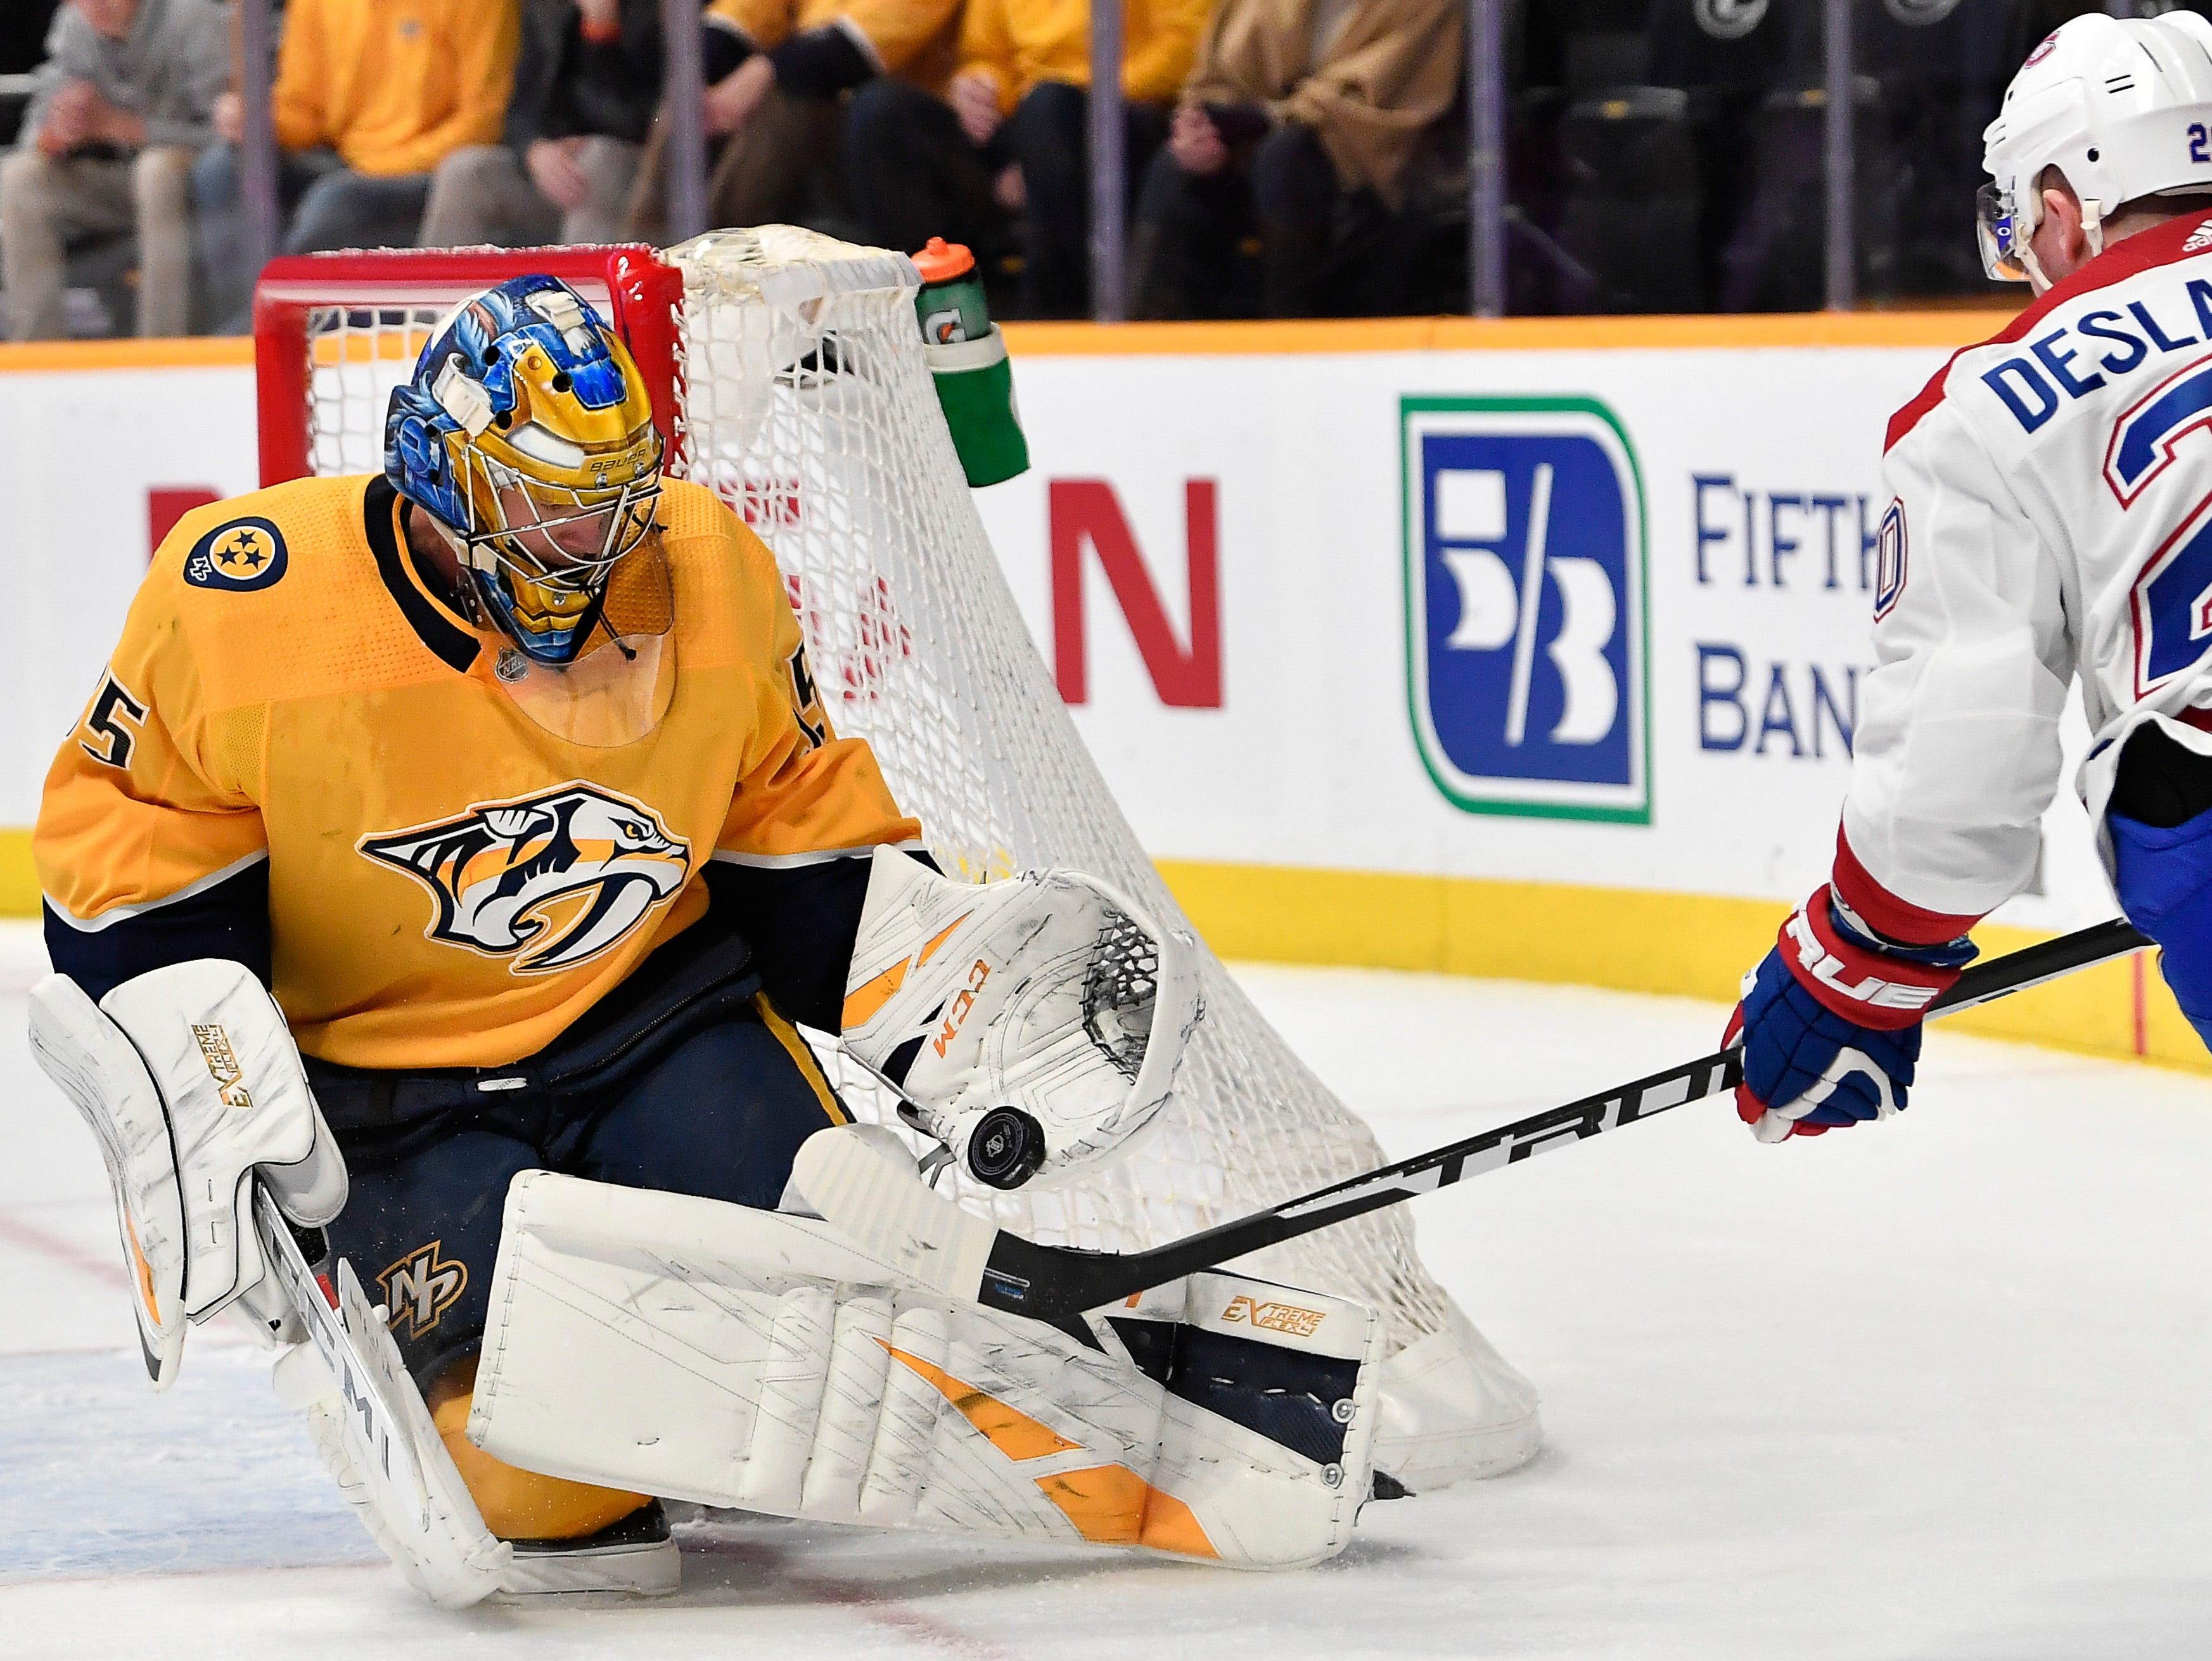 Predators goaltender Pekka Rinne (35) defends the goal against Canadiens center Phillip Danault (24) during the second period at Bridgestone Arena Thursday, Feb. 14, 2019 in Nashville, Tenn.